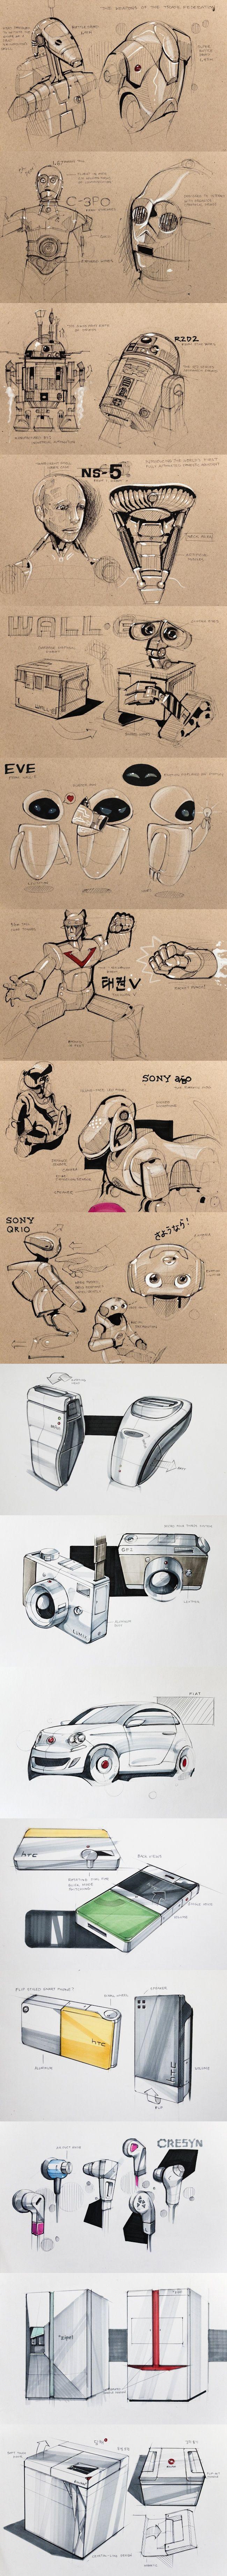 SKETCHS & ILLUSTRATIONS / Sketches - 1 — Minimally Minimal